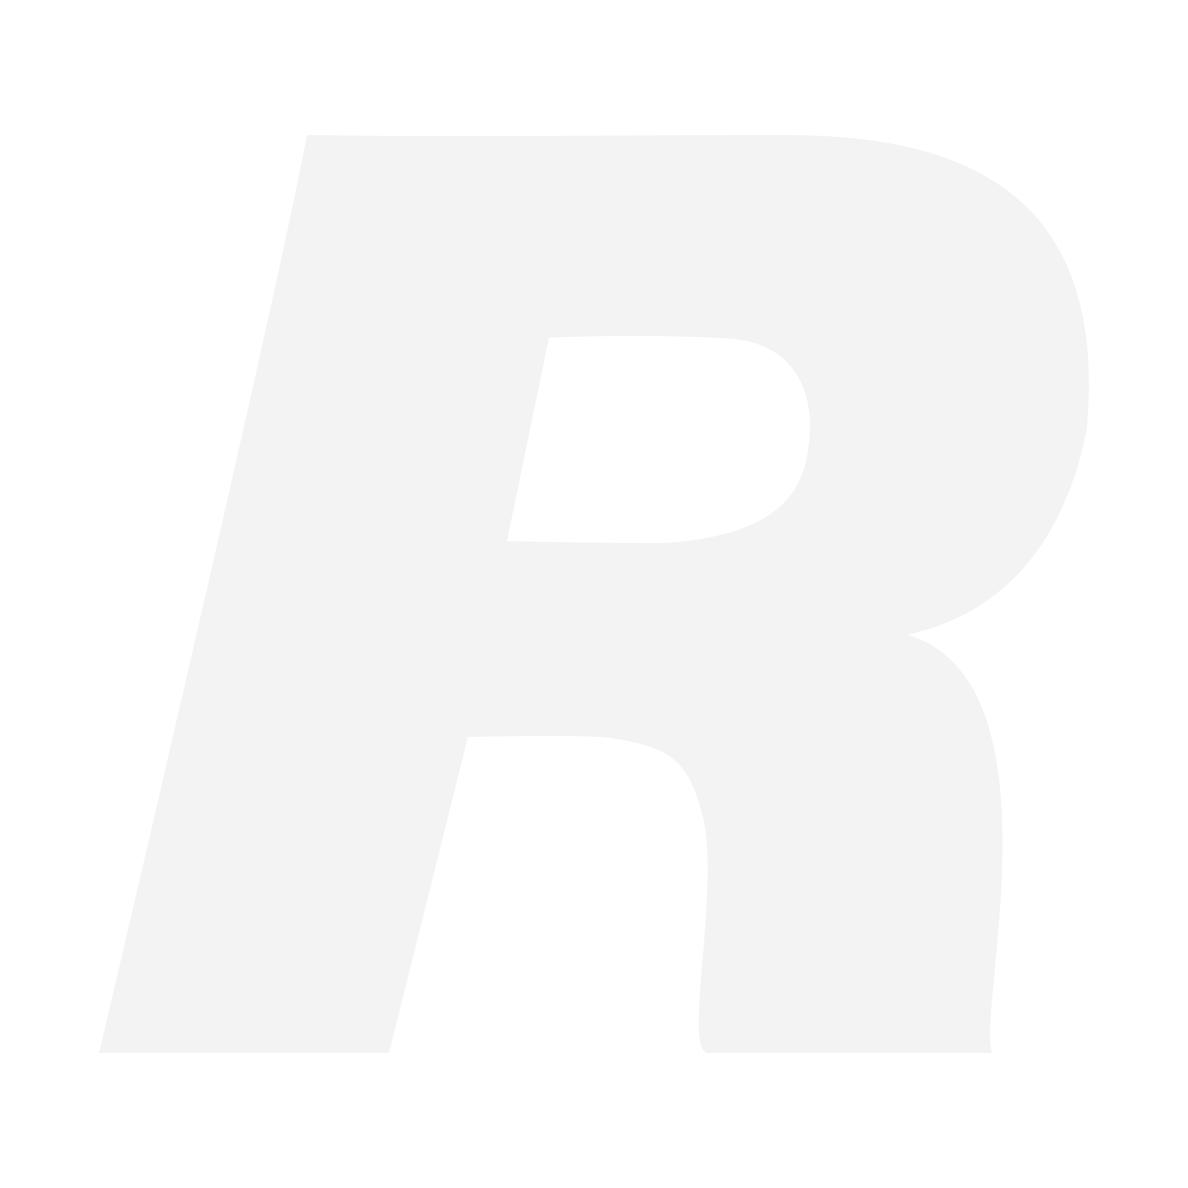 GoPro Hero 6 Black + Lowepro Dashpoint AVC1